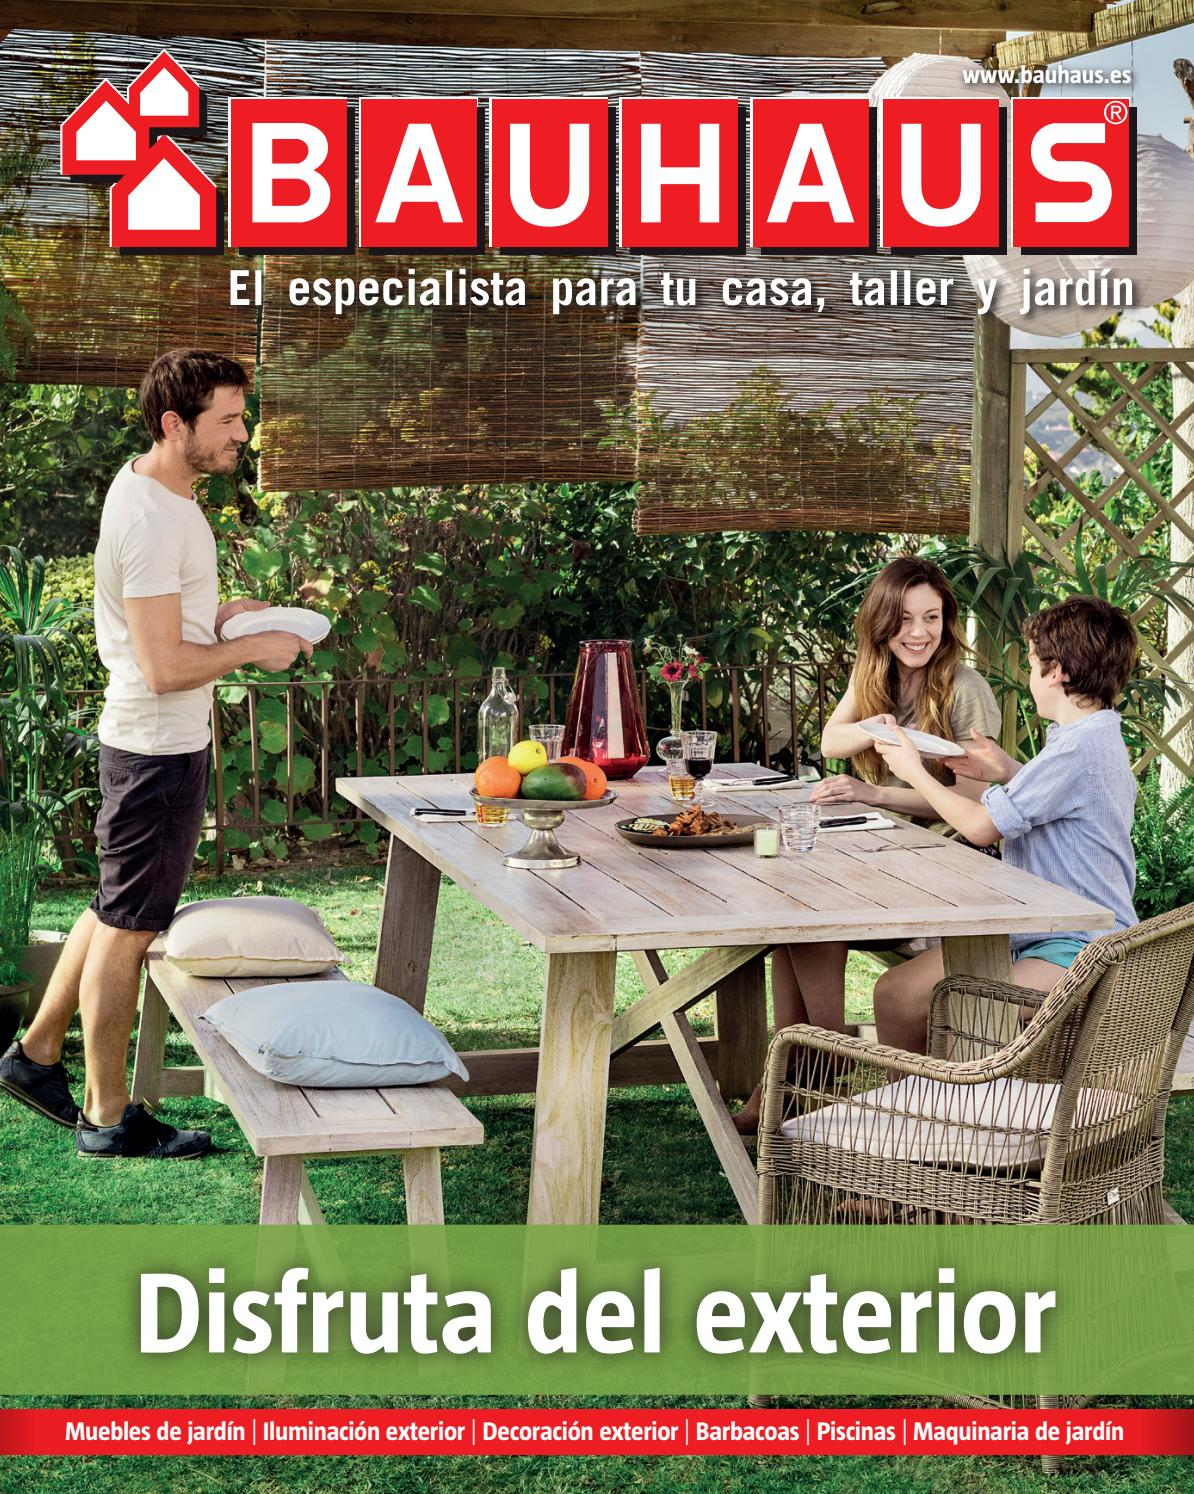 Ventanas Pvc Bauhaus.Especial Jardin Bauhaus By Bauhaus Issuu